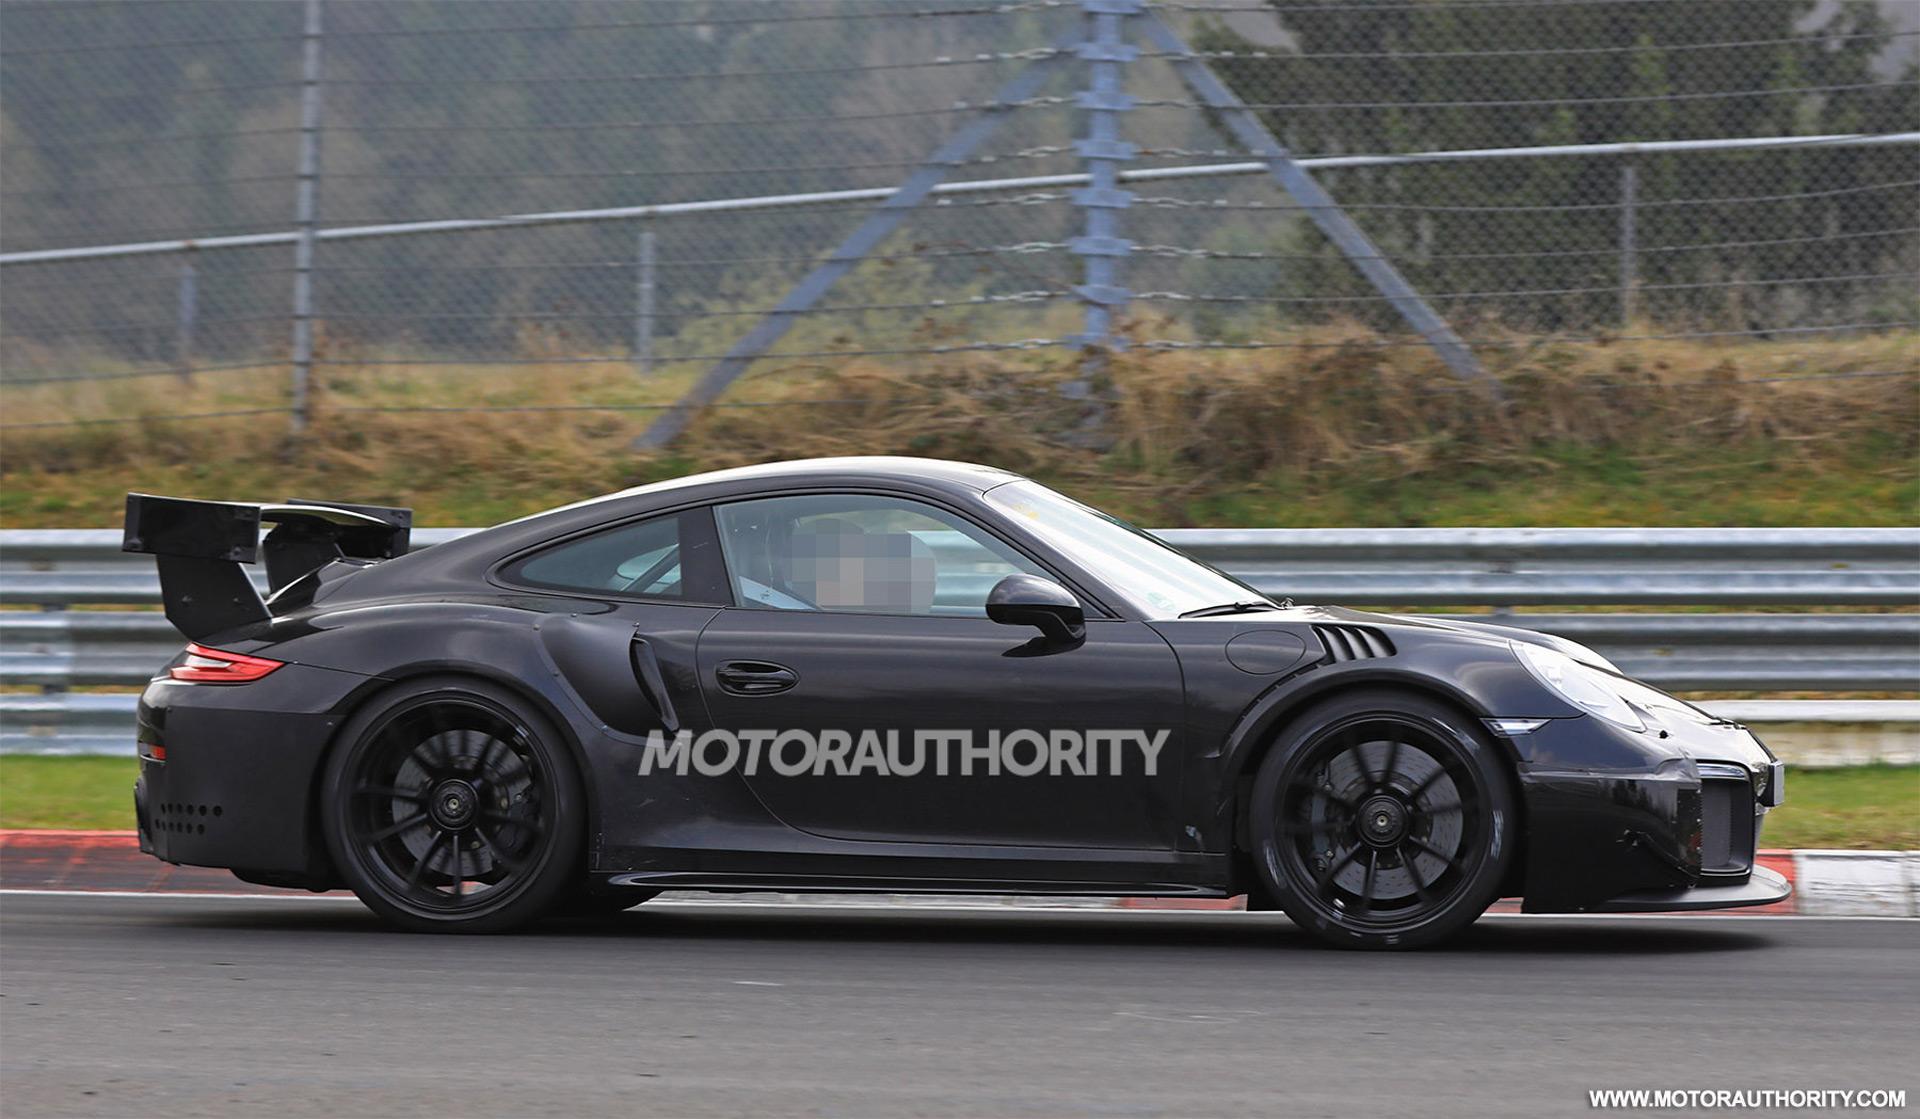 2018-porsche-911-gt2-spy-shots--image-via-s-baldauf-sb-medien_100599783_h Cozy Porsche 911 Gt2 Rs Turbo Price Cars Trend